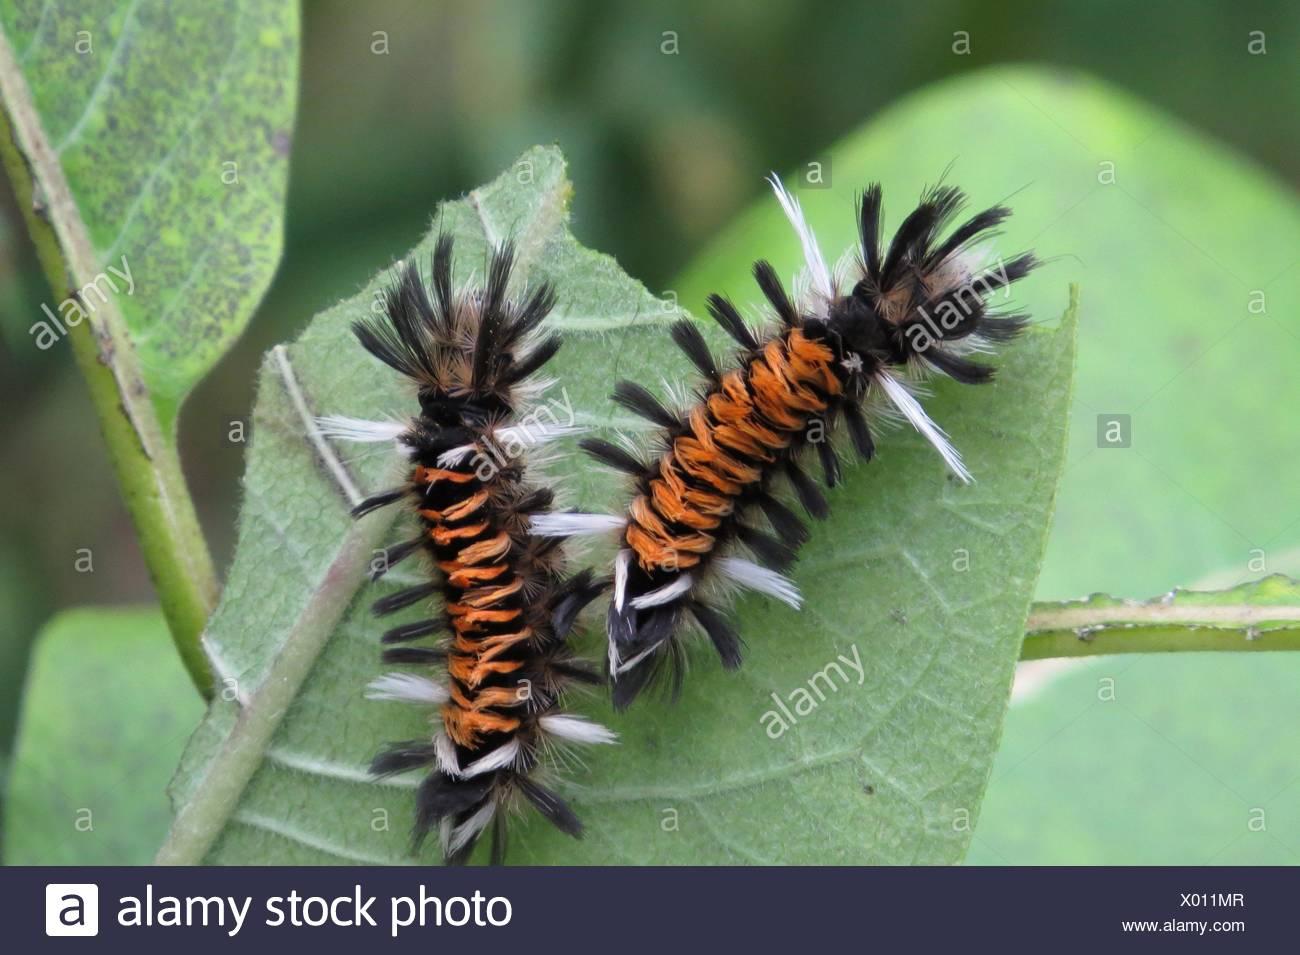 Euchaetes egle, milkweed tussock caterpillar - Stock Image